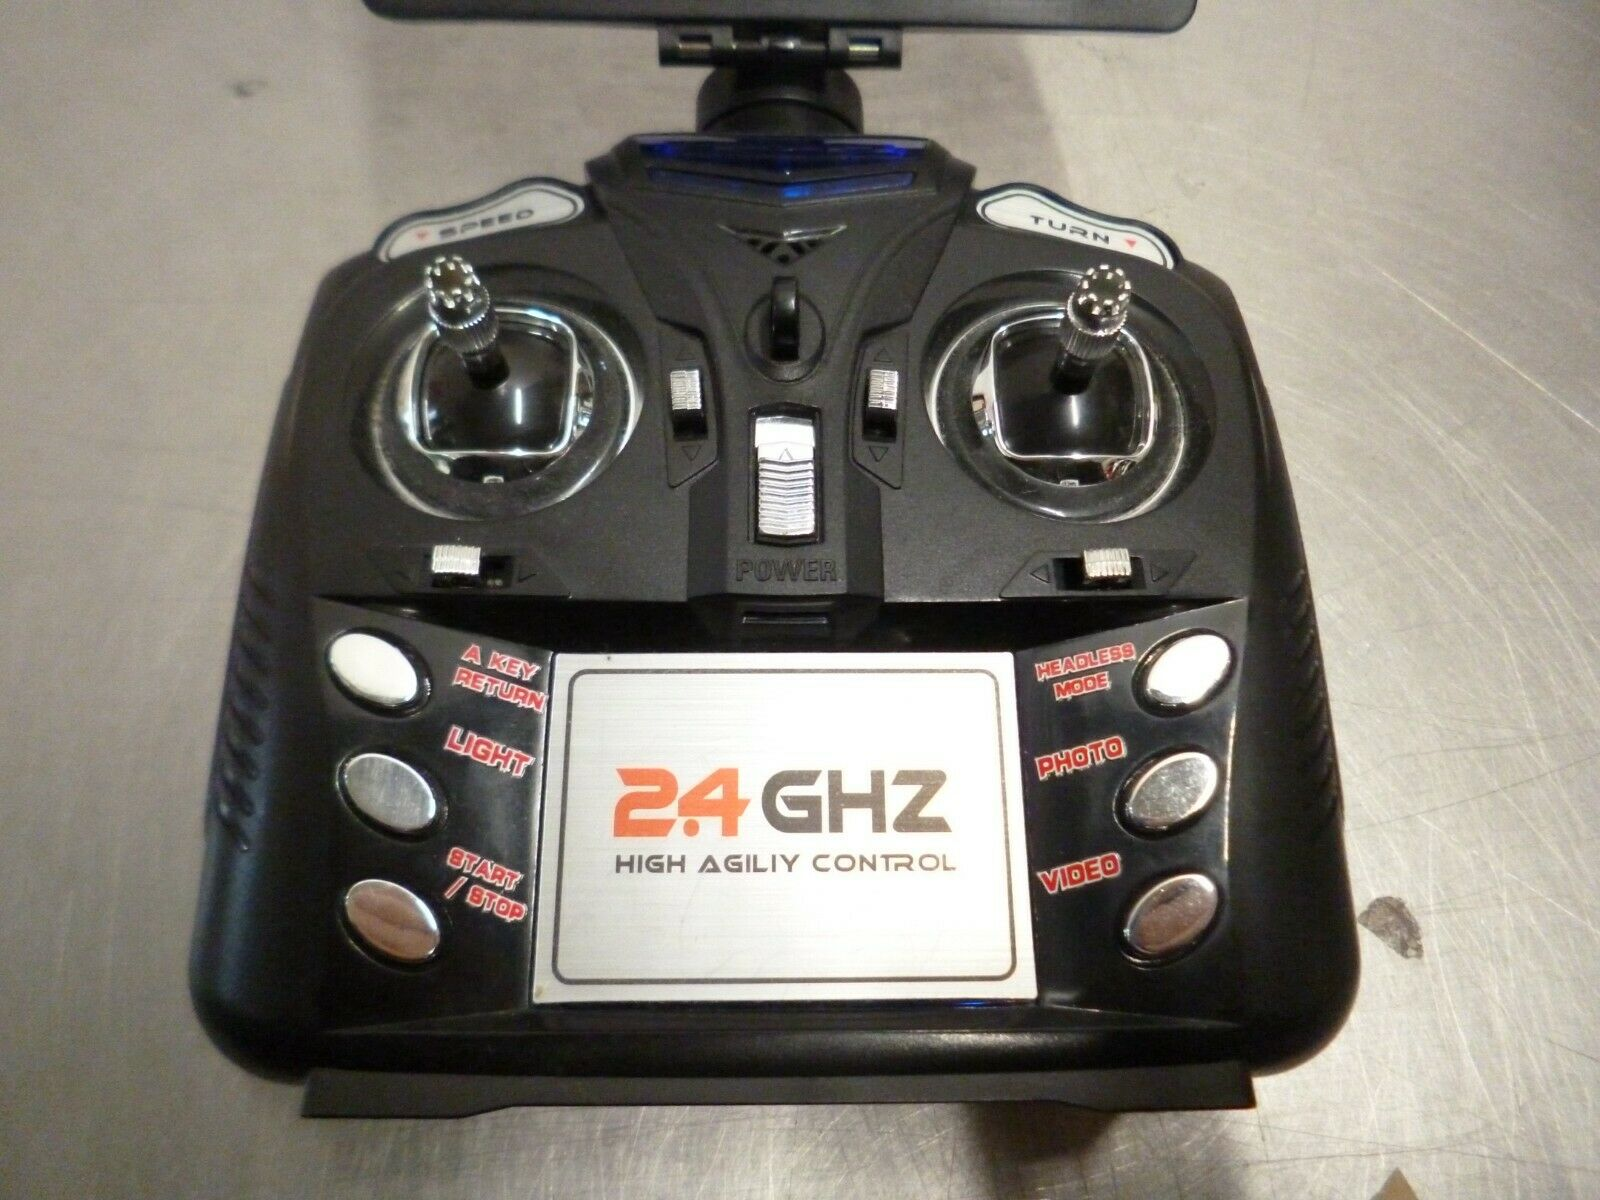 2.4 GHZ high agility control pad.